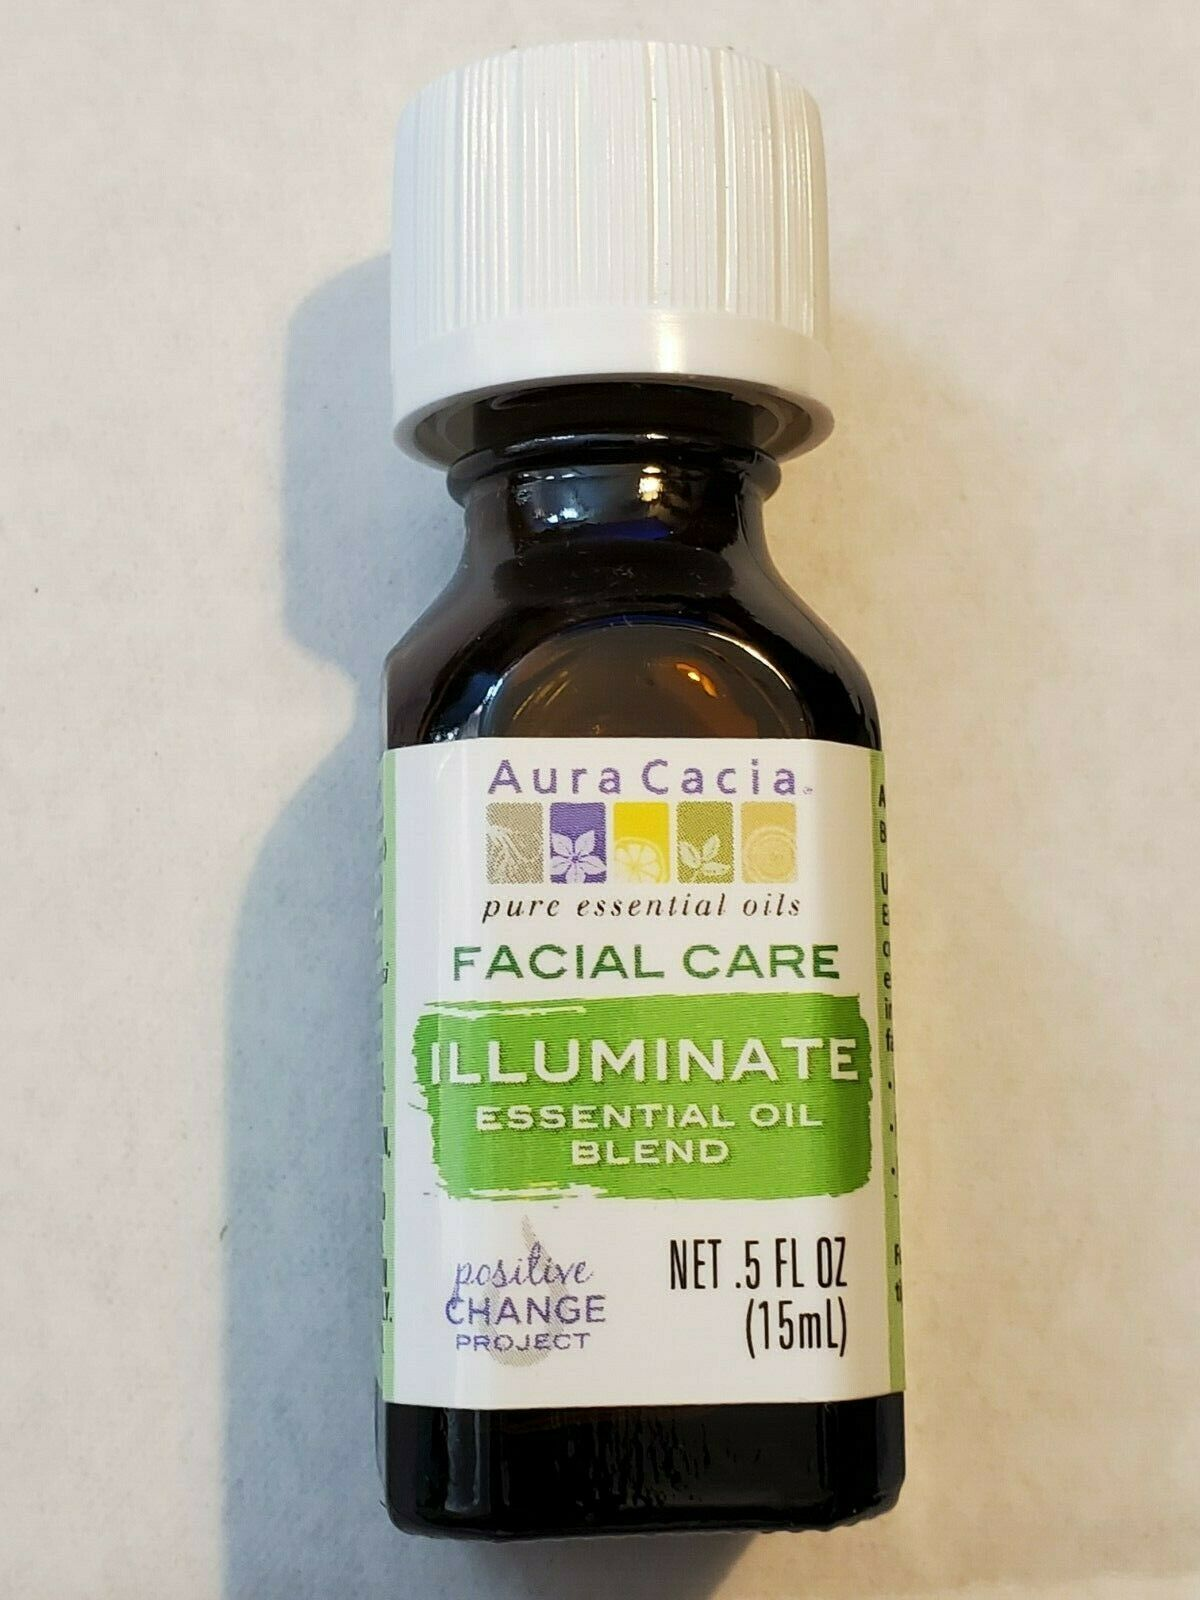 Facial Care Illuminate Essential Oil Blend Aura Cacia 0.5 fl